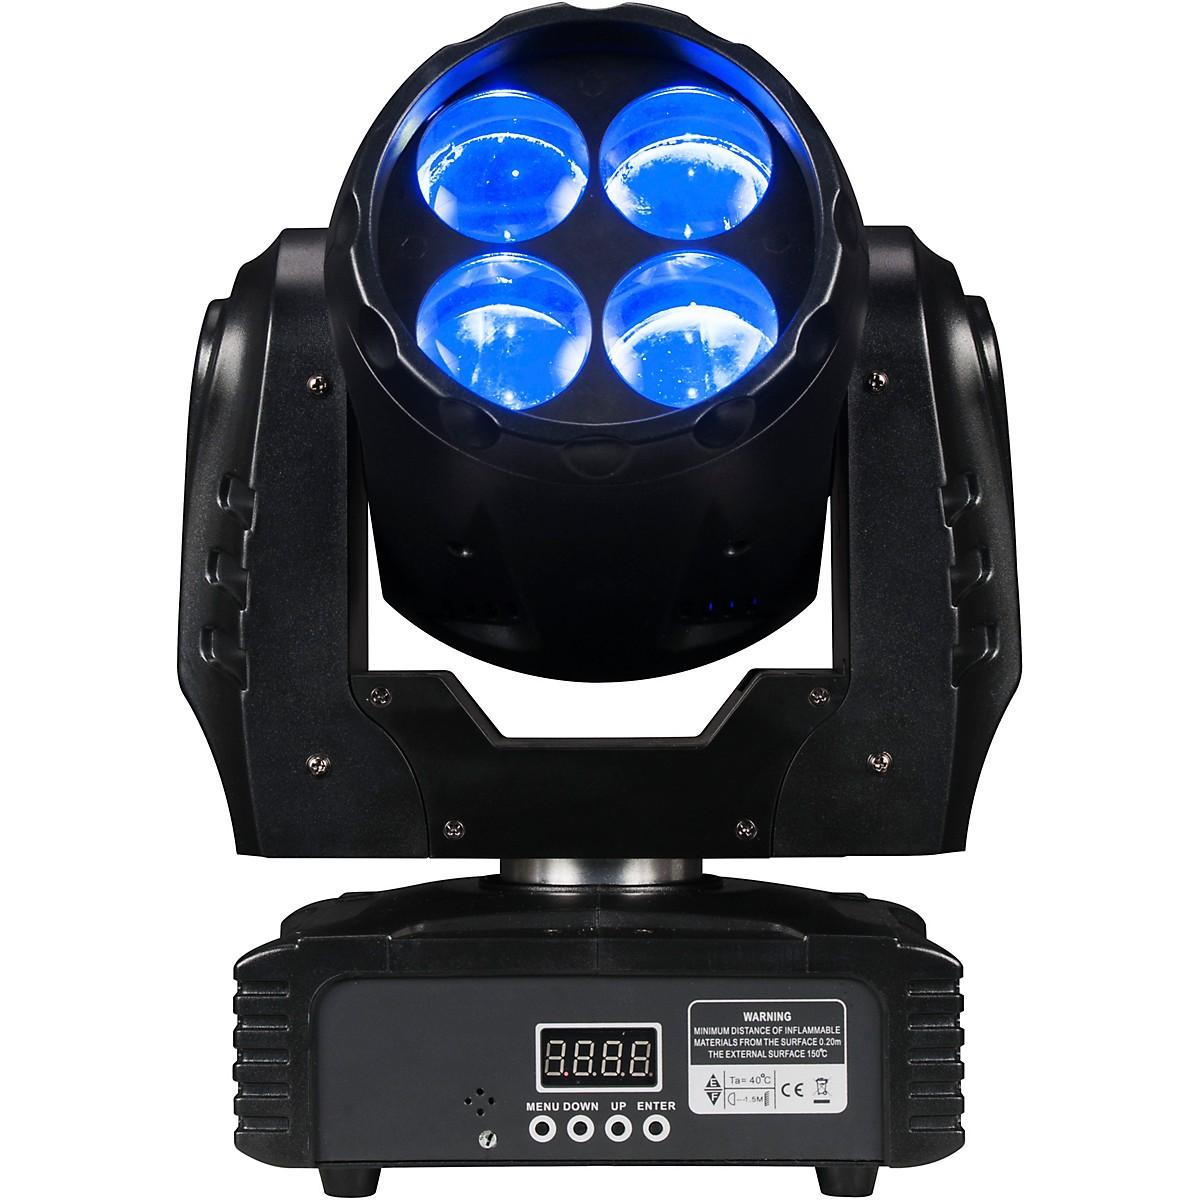 Eliminator Lighting Stealth Craze Moving-Head Mini Beam Light with Color Wheels